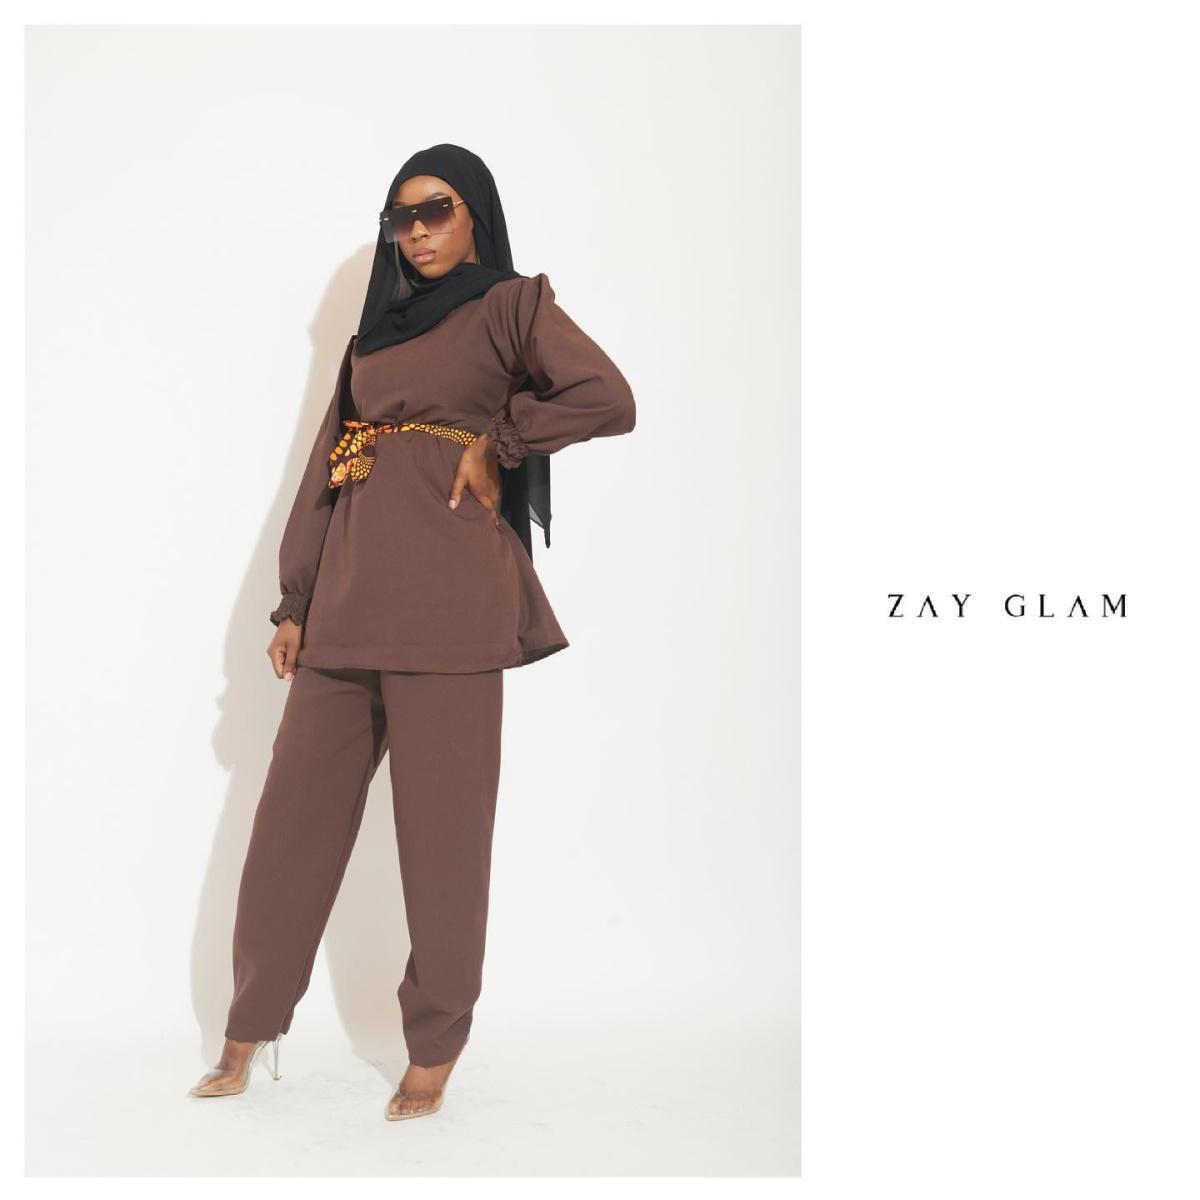 ZayGlam